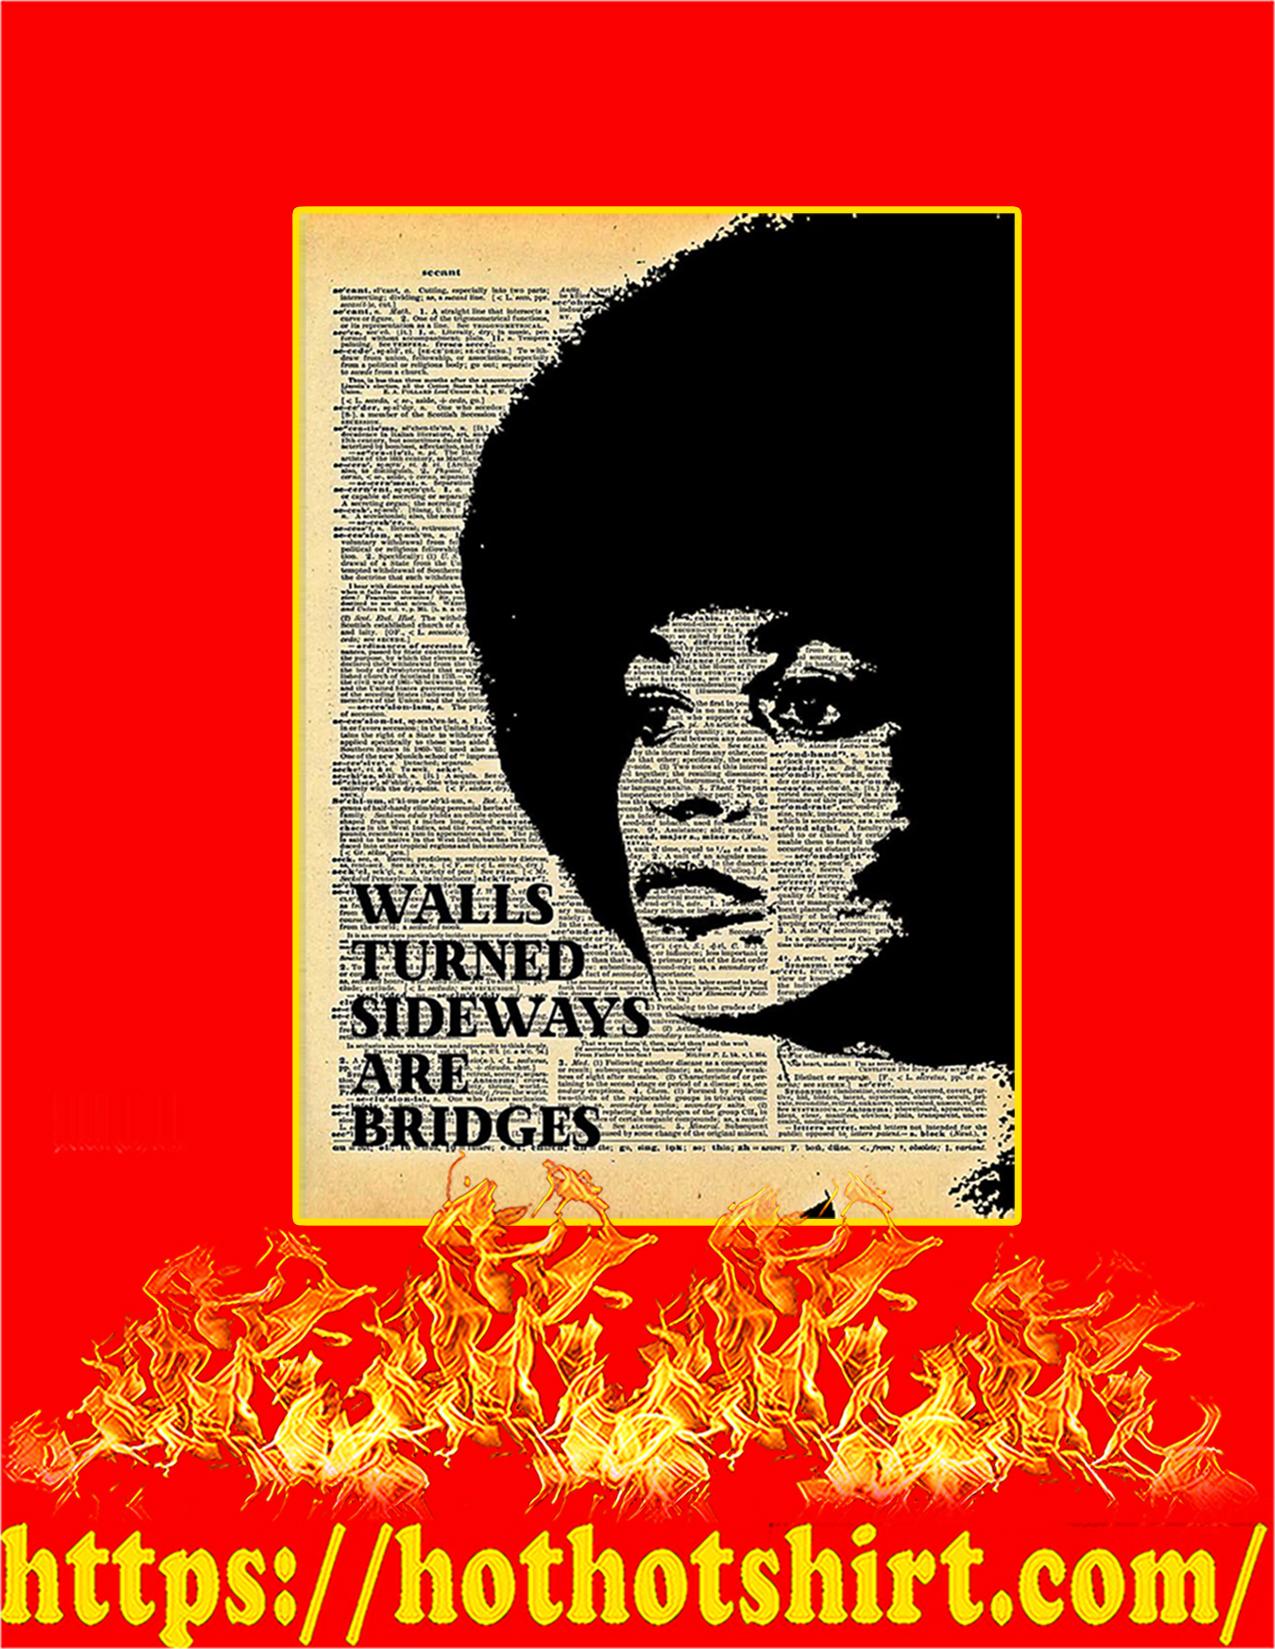 Angela Davis Walls turned sideways are bridges poster - A2